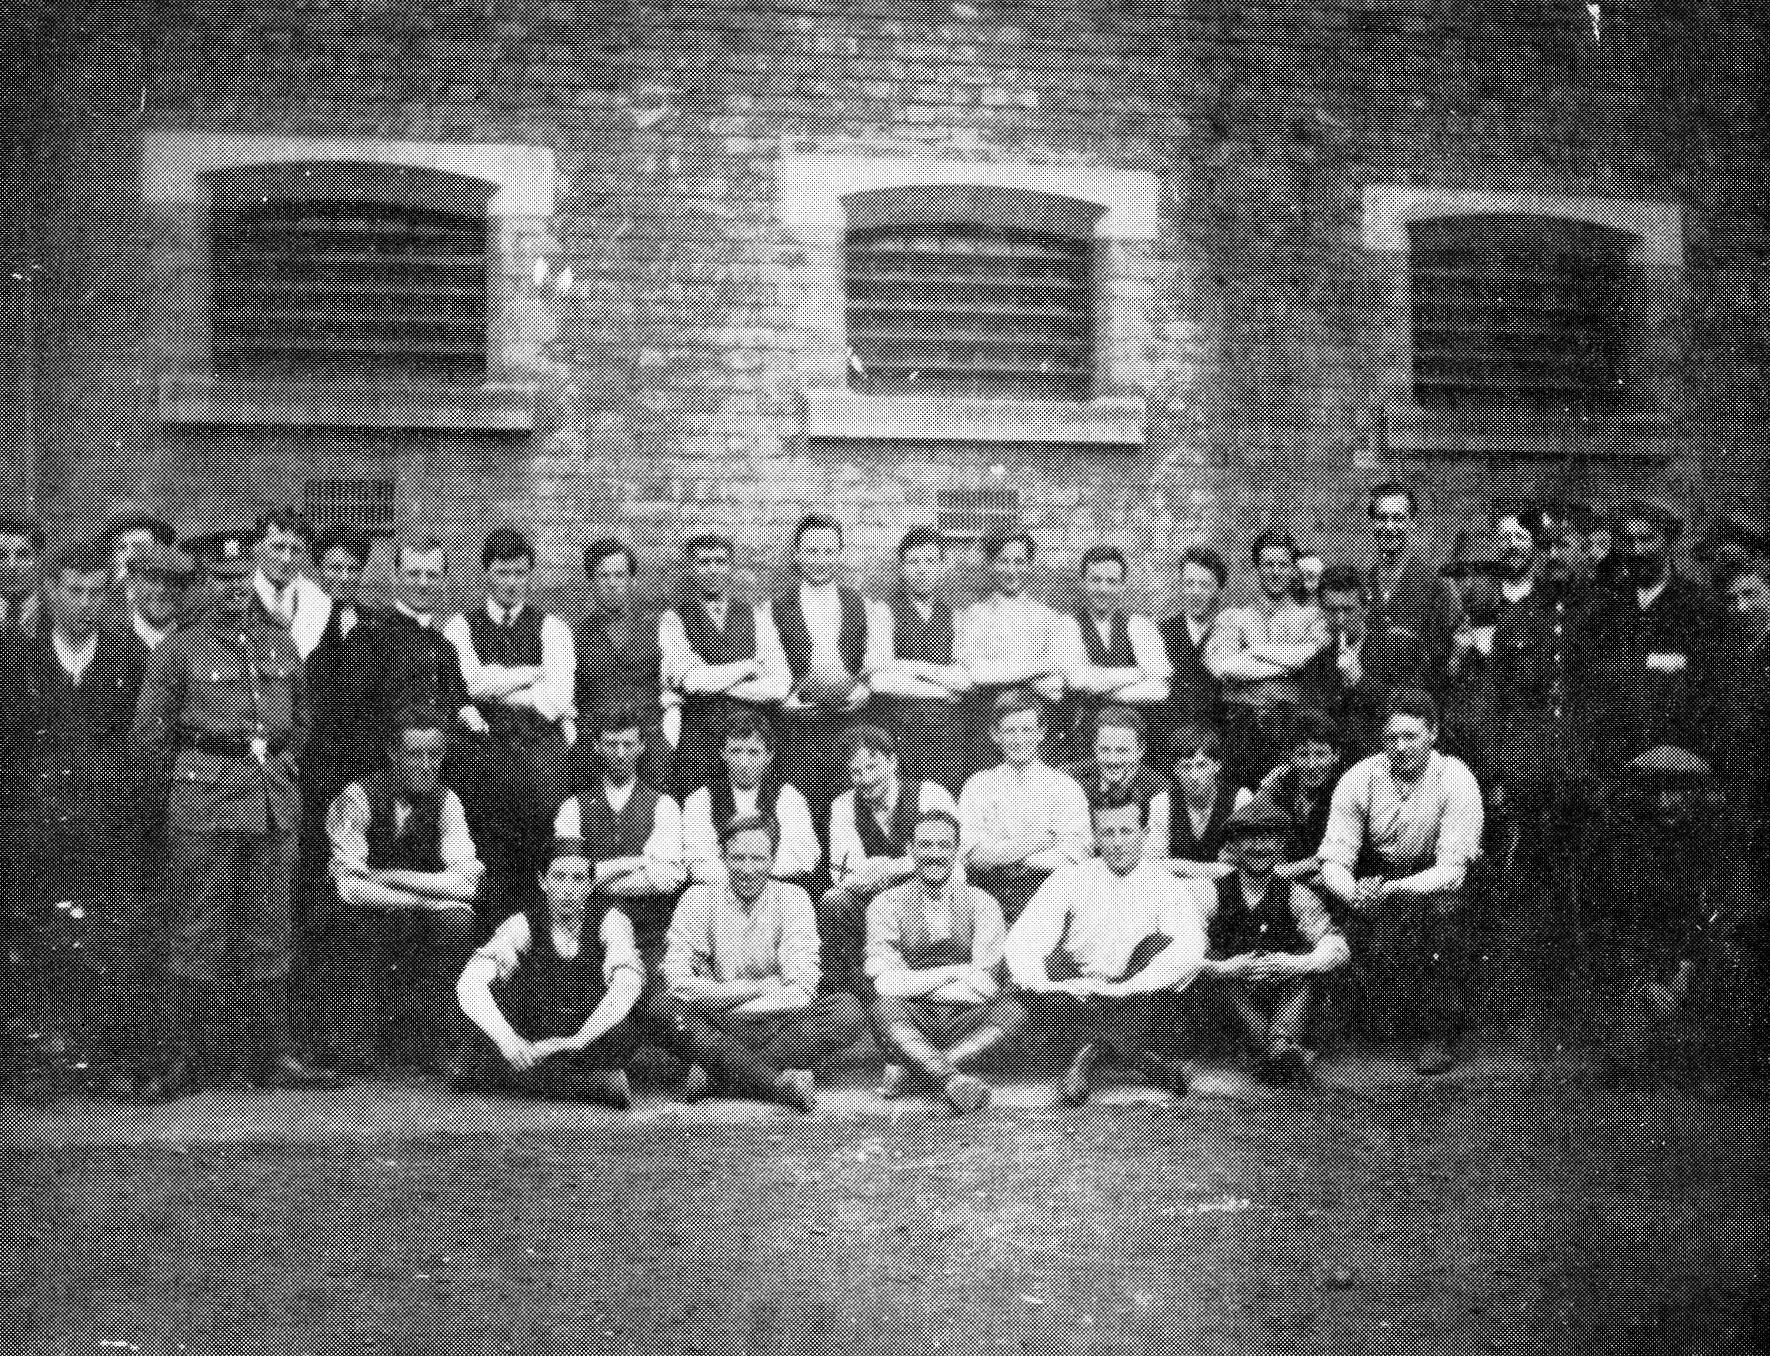 Gaelic Football Teams posing in Stafford Jail, 1916